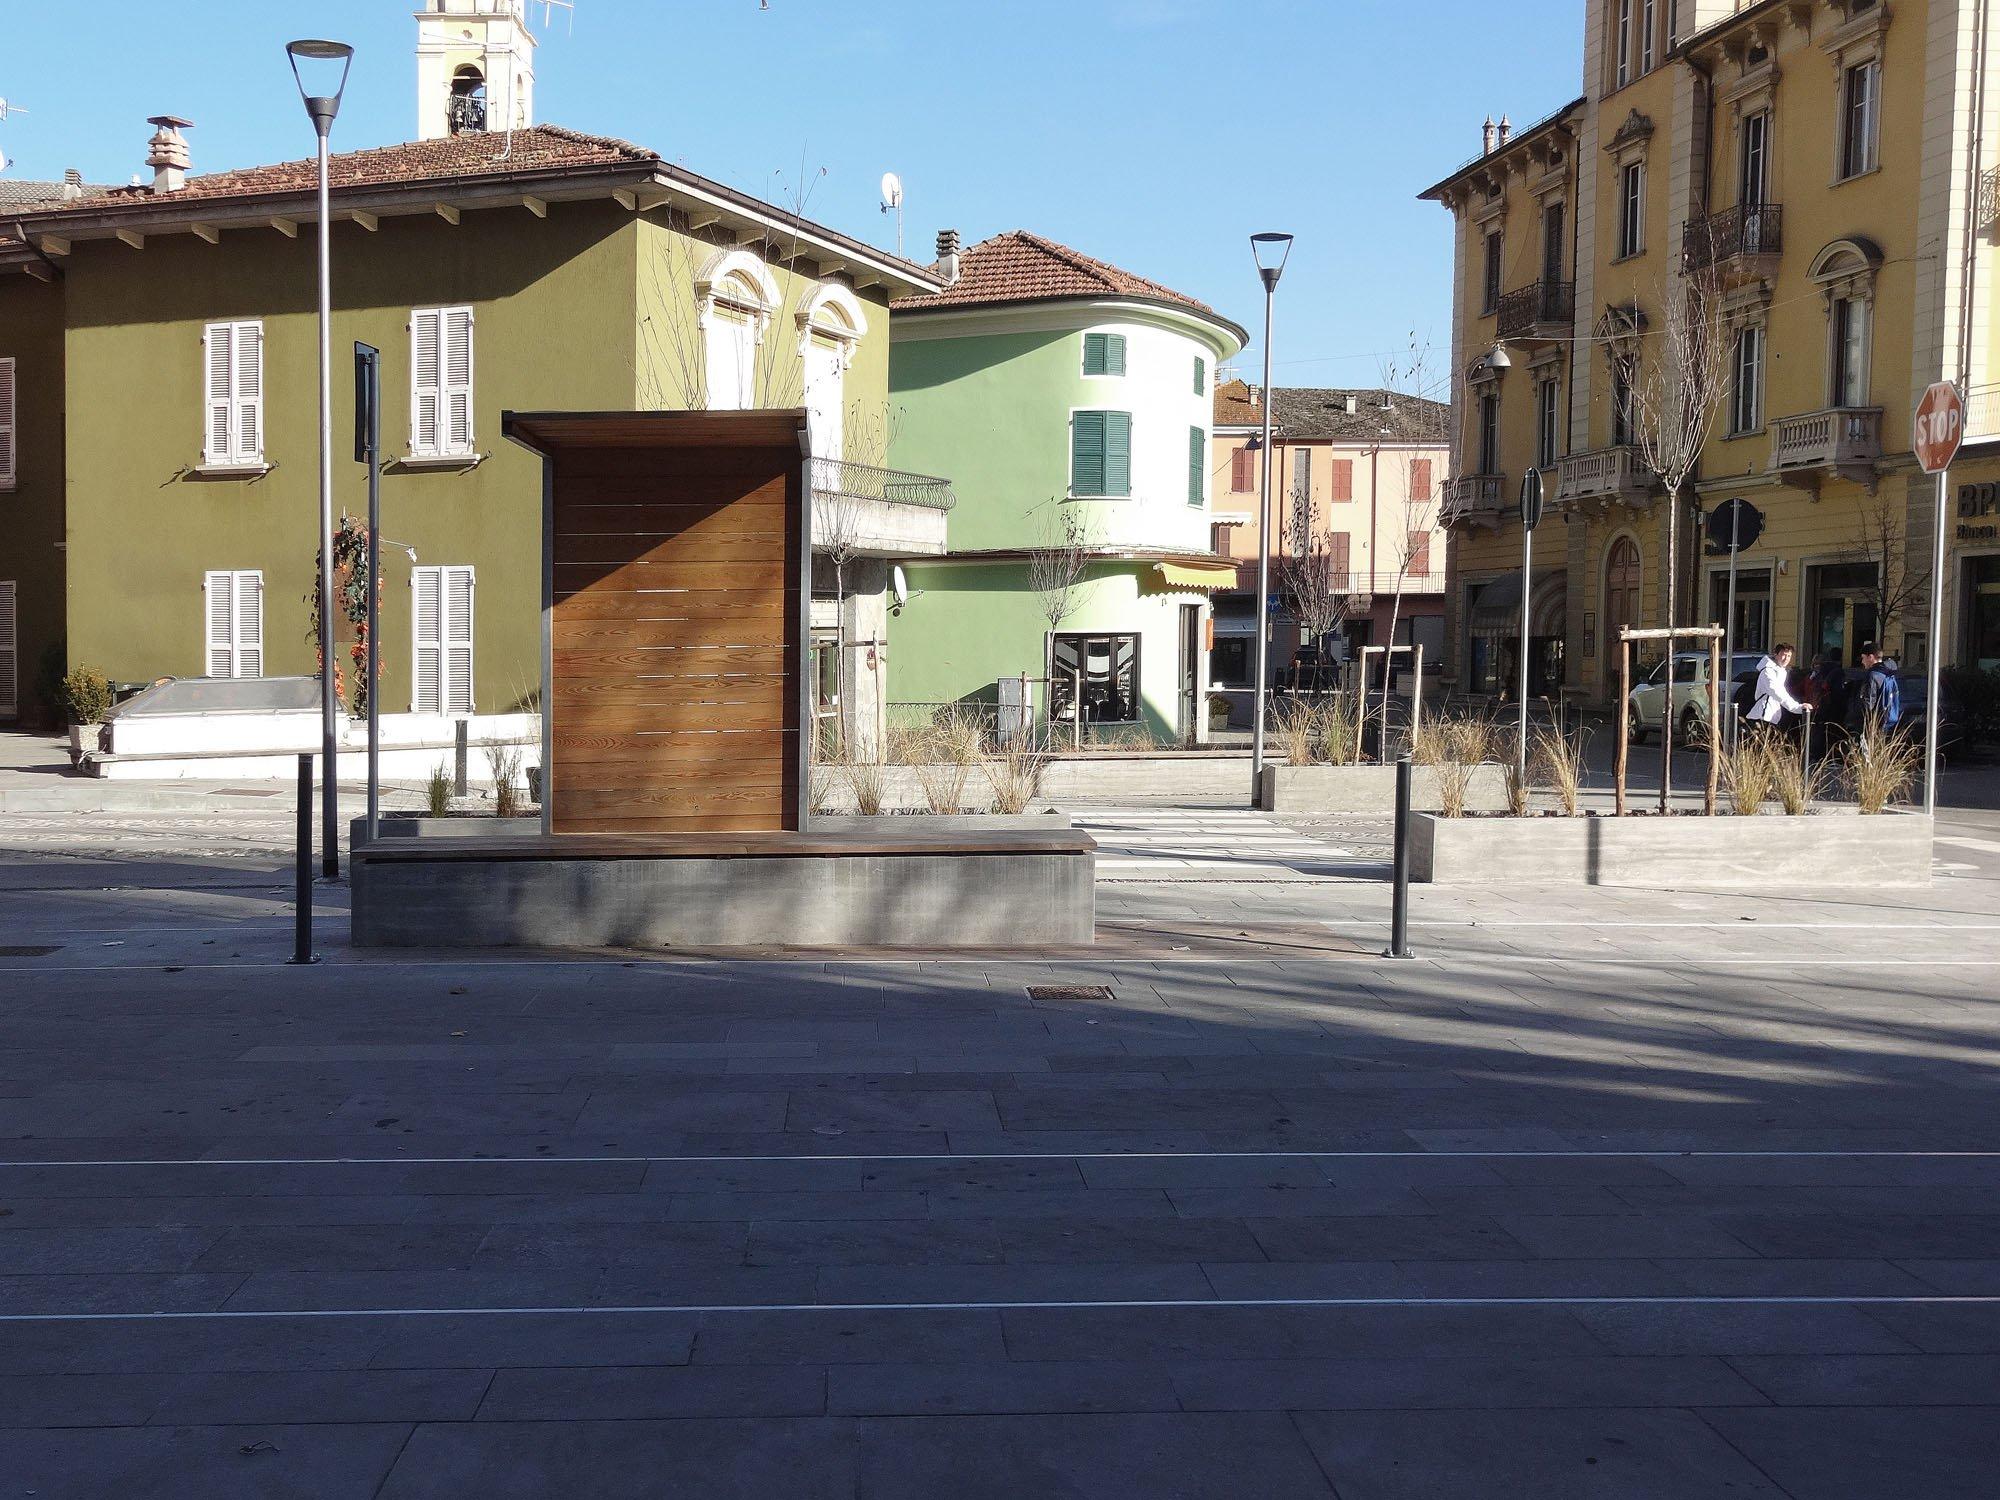 Vista diurna terminal sosta dei pulma Francesco Adorni